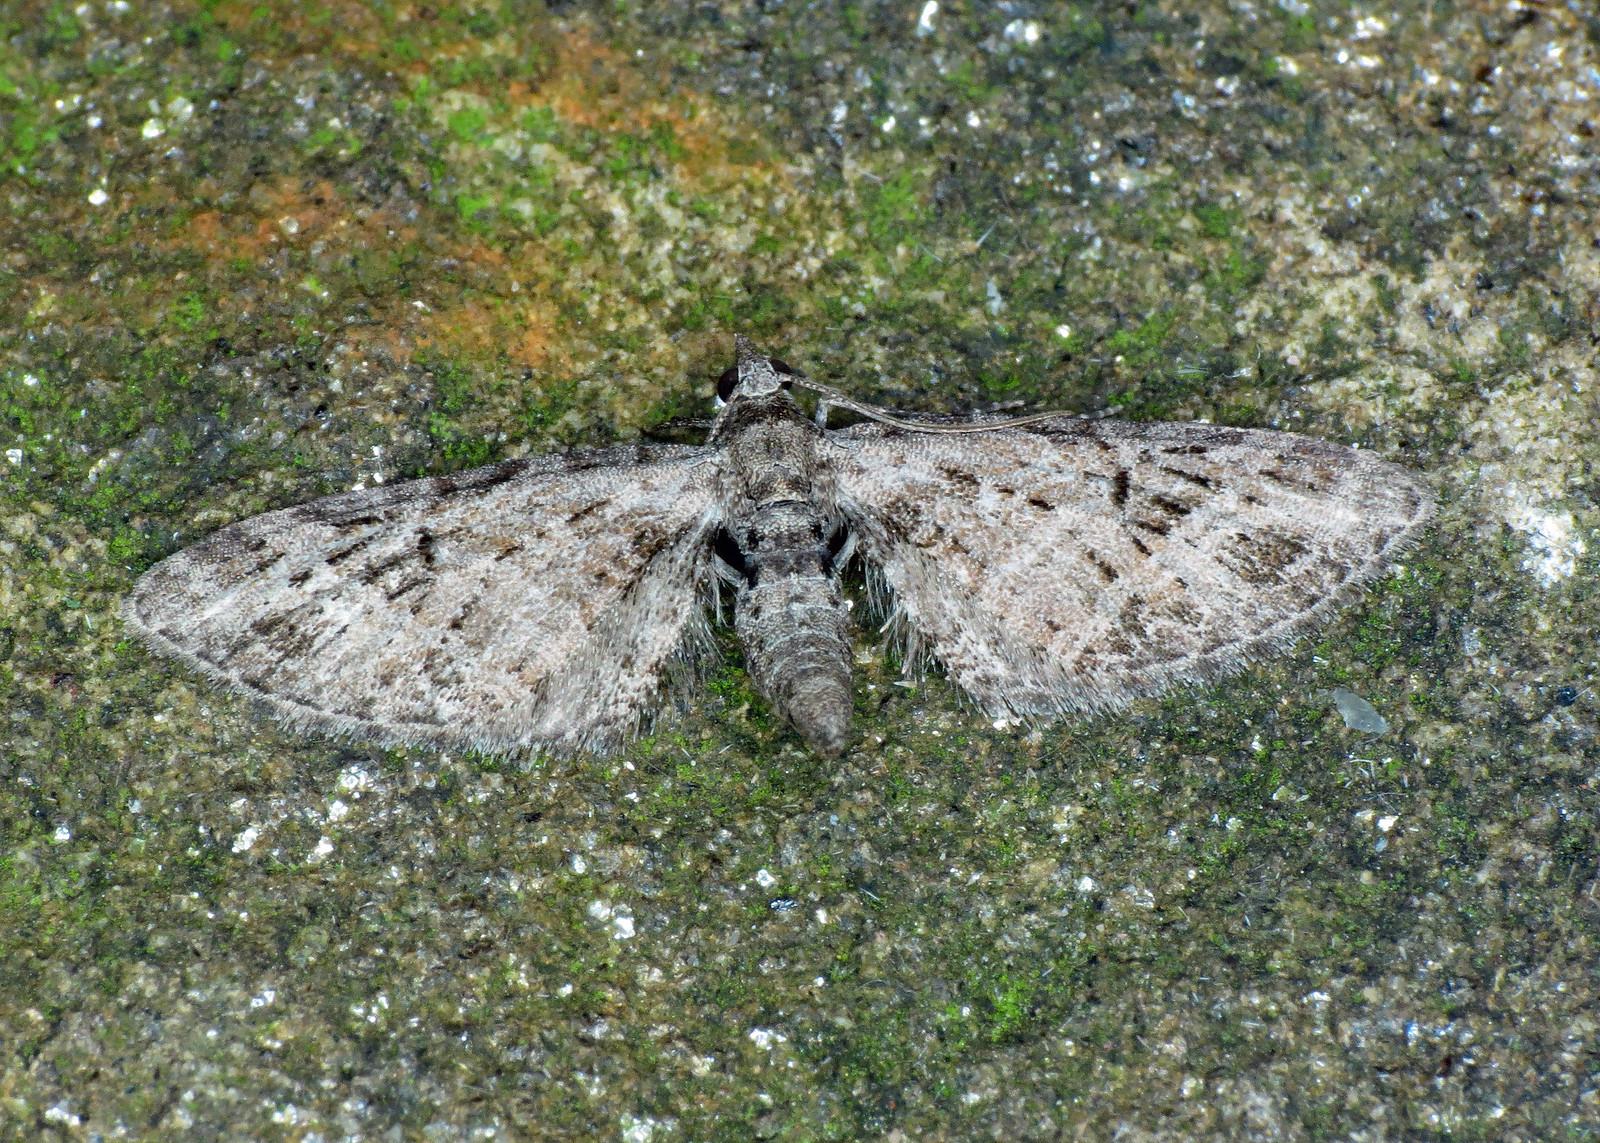 1819 Mottled Pug - Eupithecia exiguata